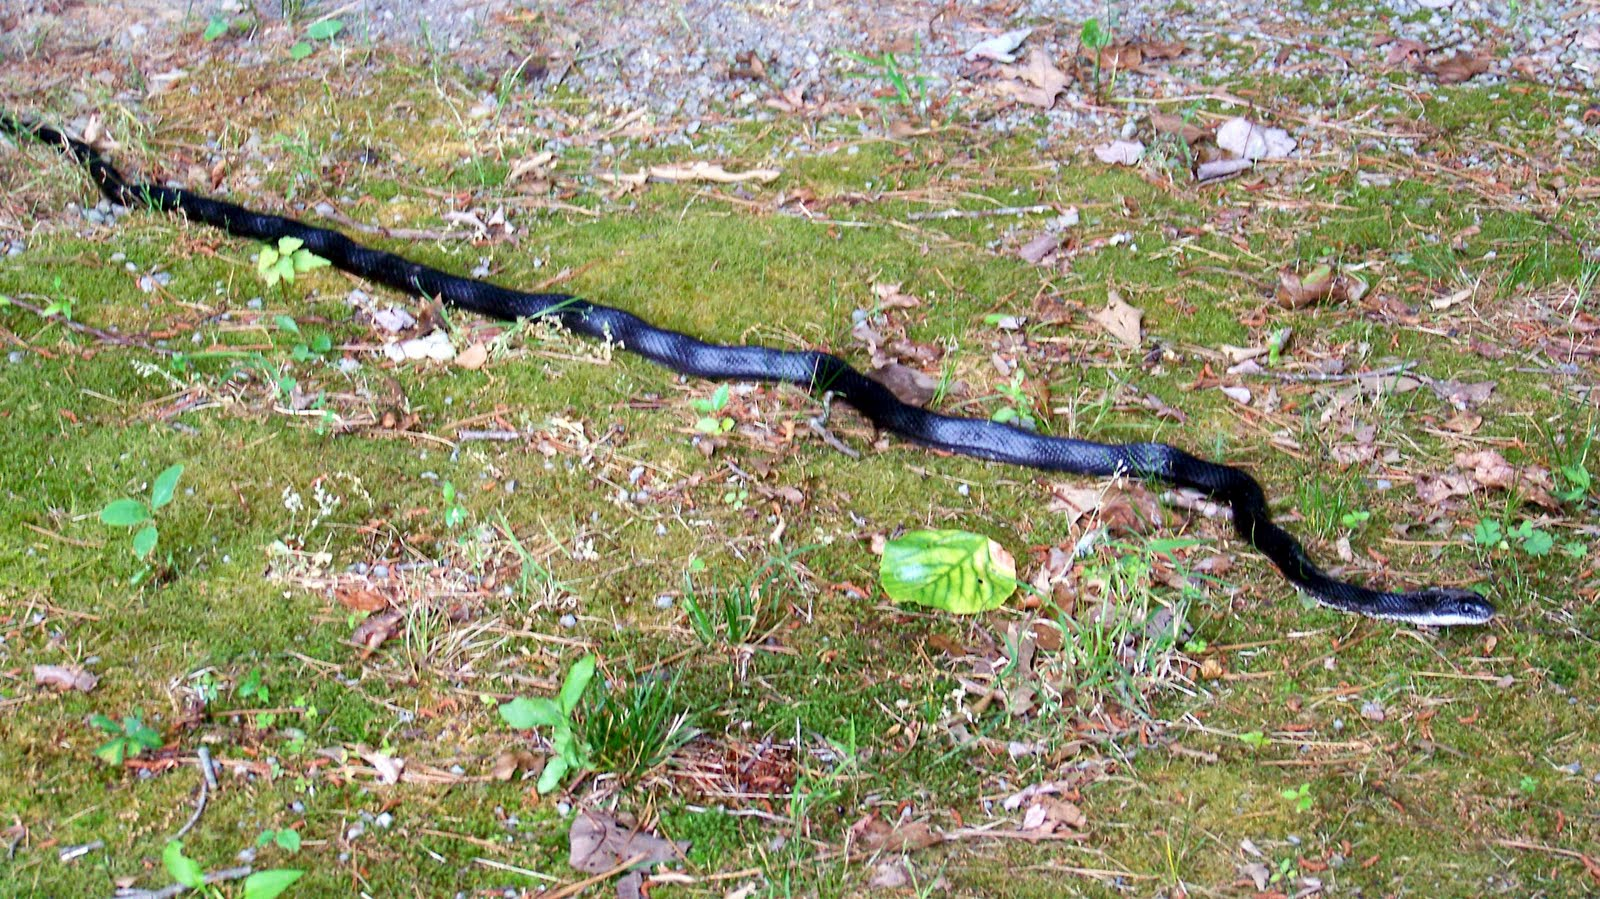 Hd Wallpaper Of Black Snake: HD Wallpaper Of Black Snake